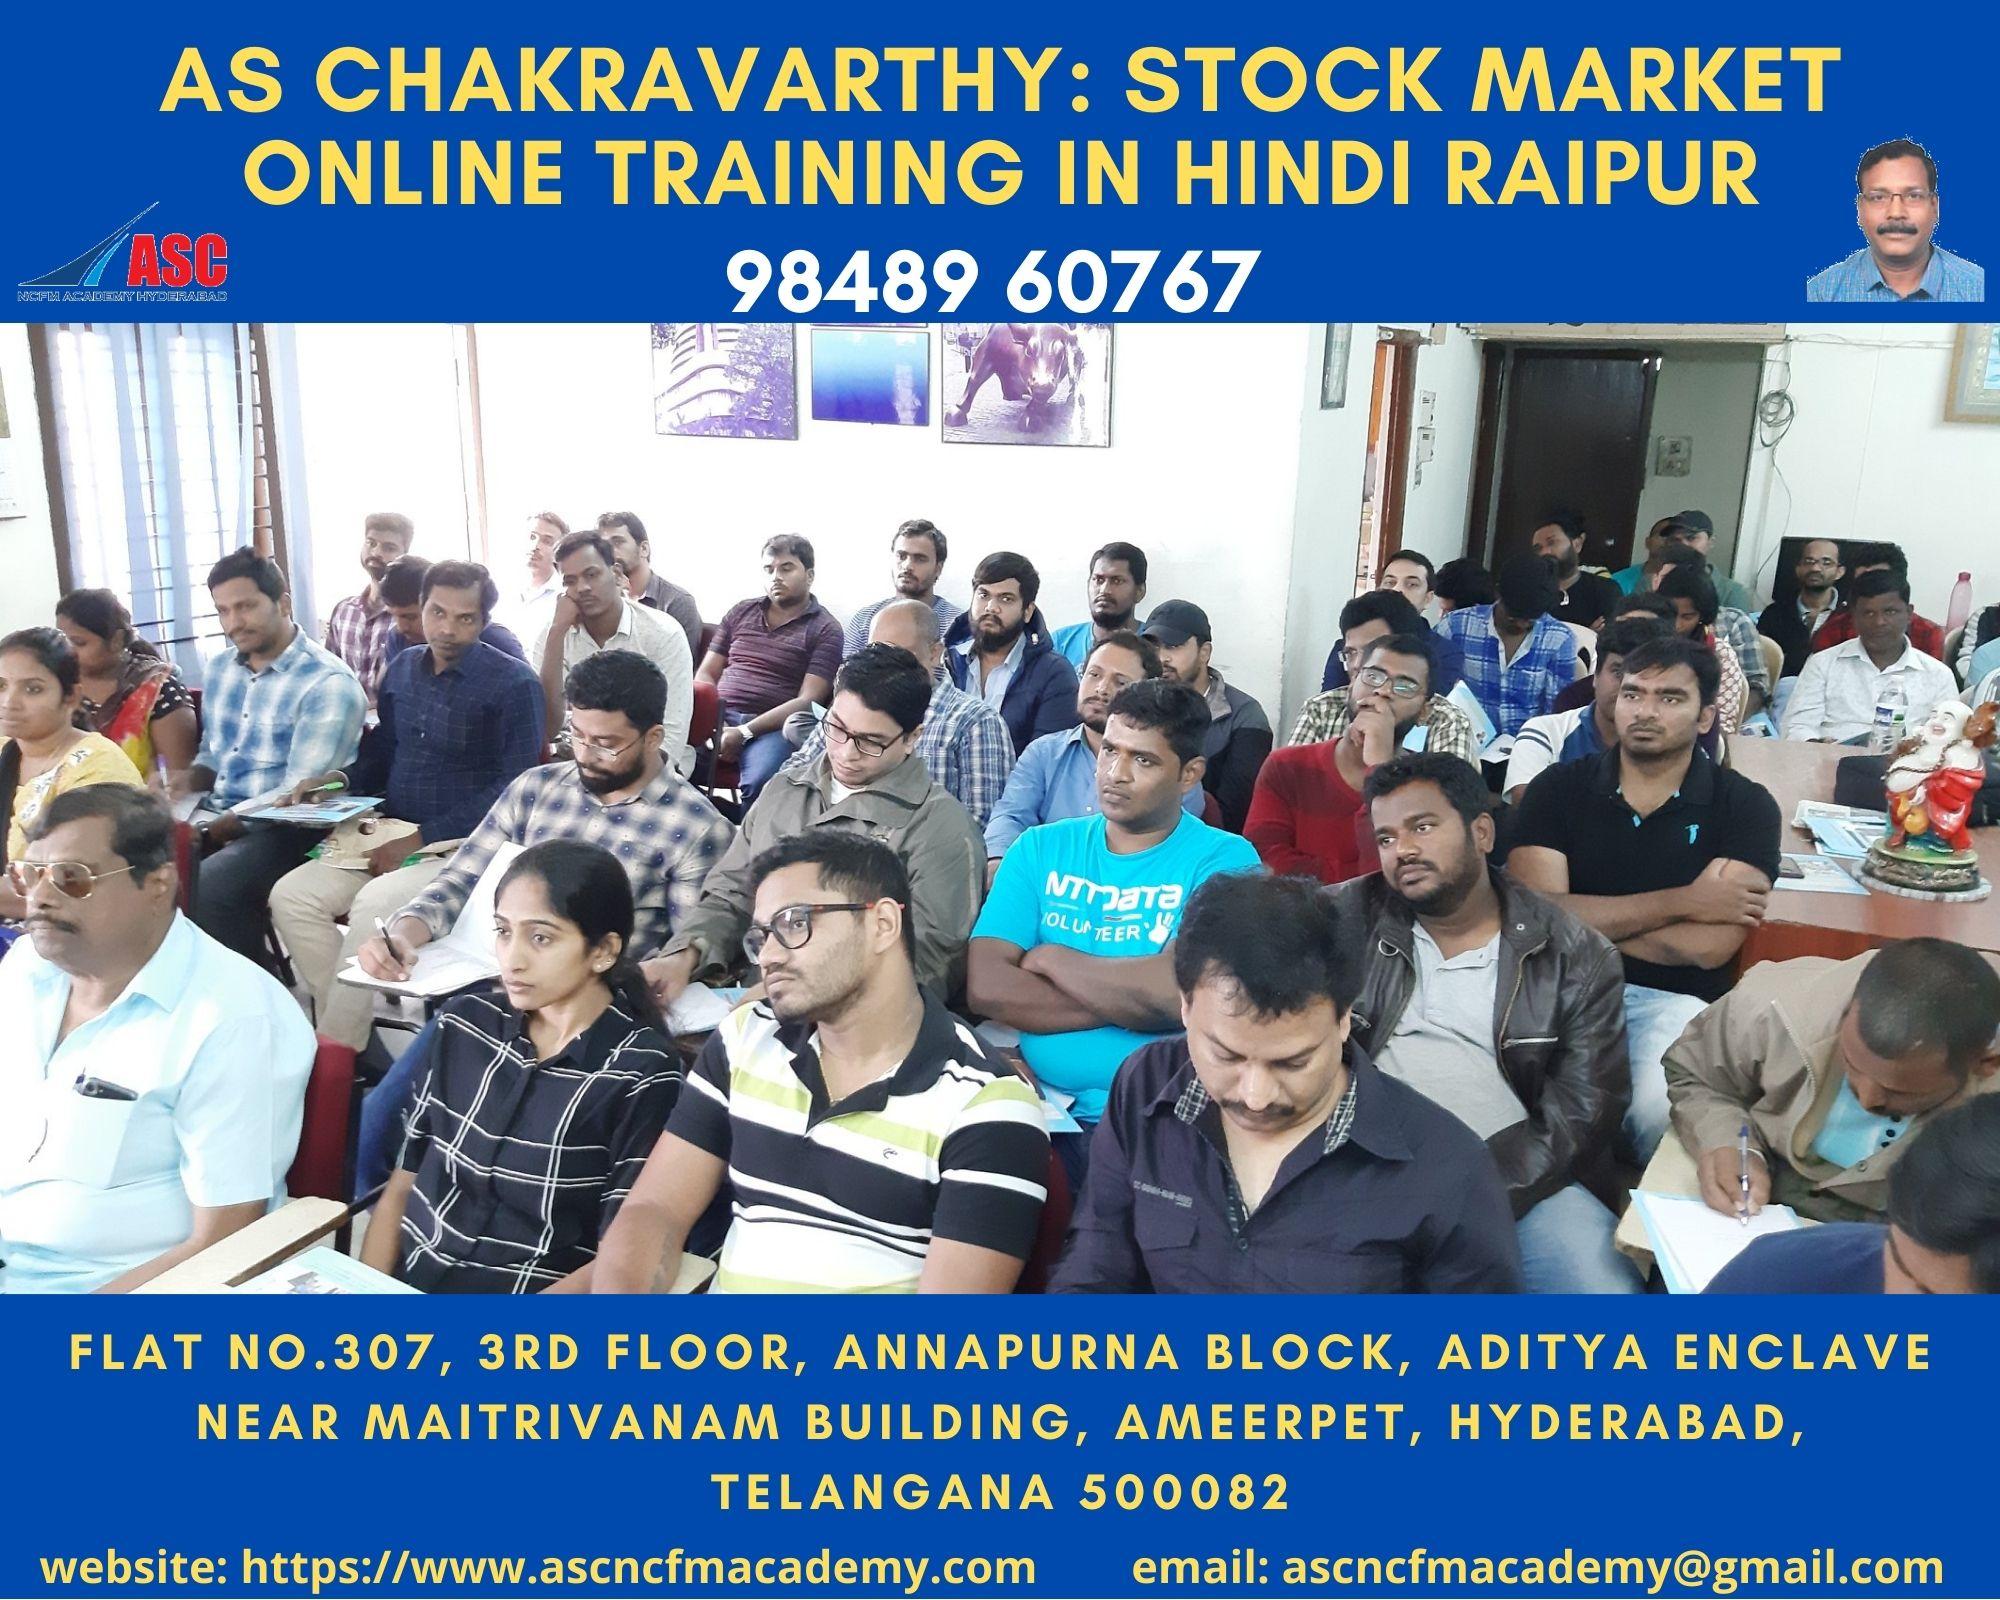 Online Stock Market Technical Training in Hindi Raipur